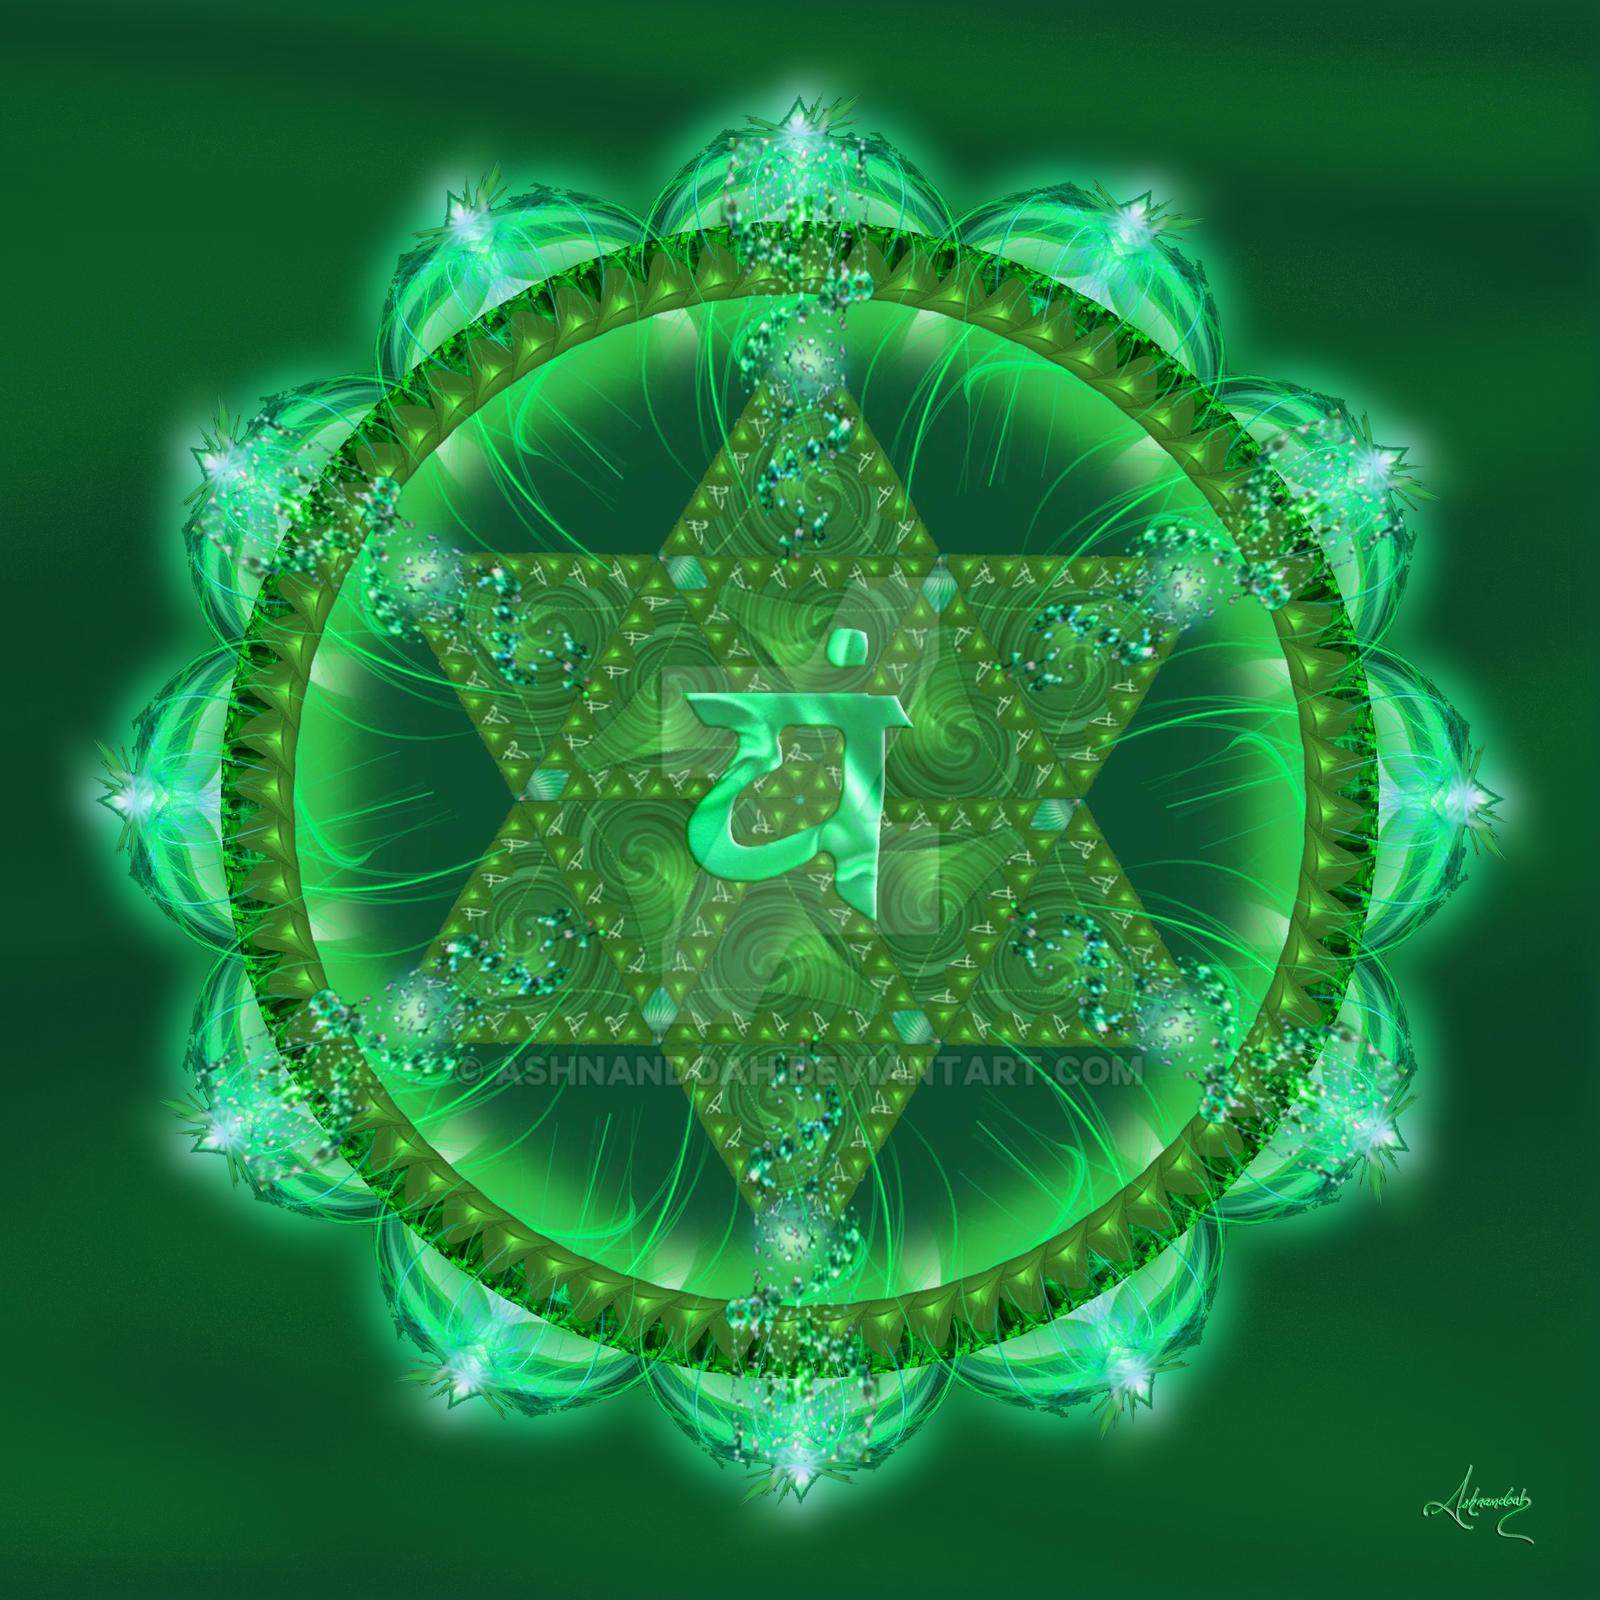 Heart Chakra Symbol Anahata By Ashnandoah